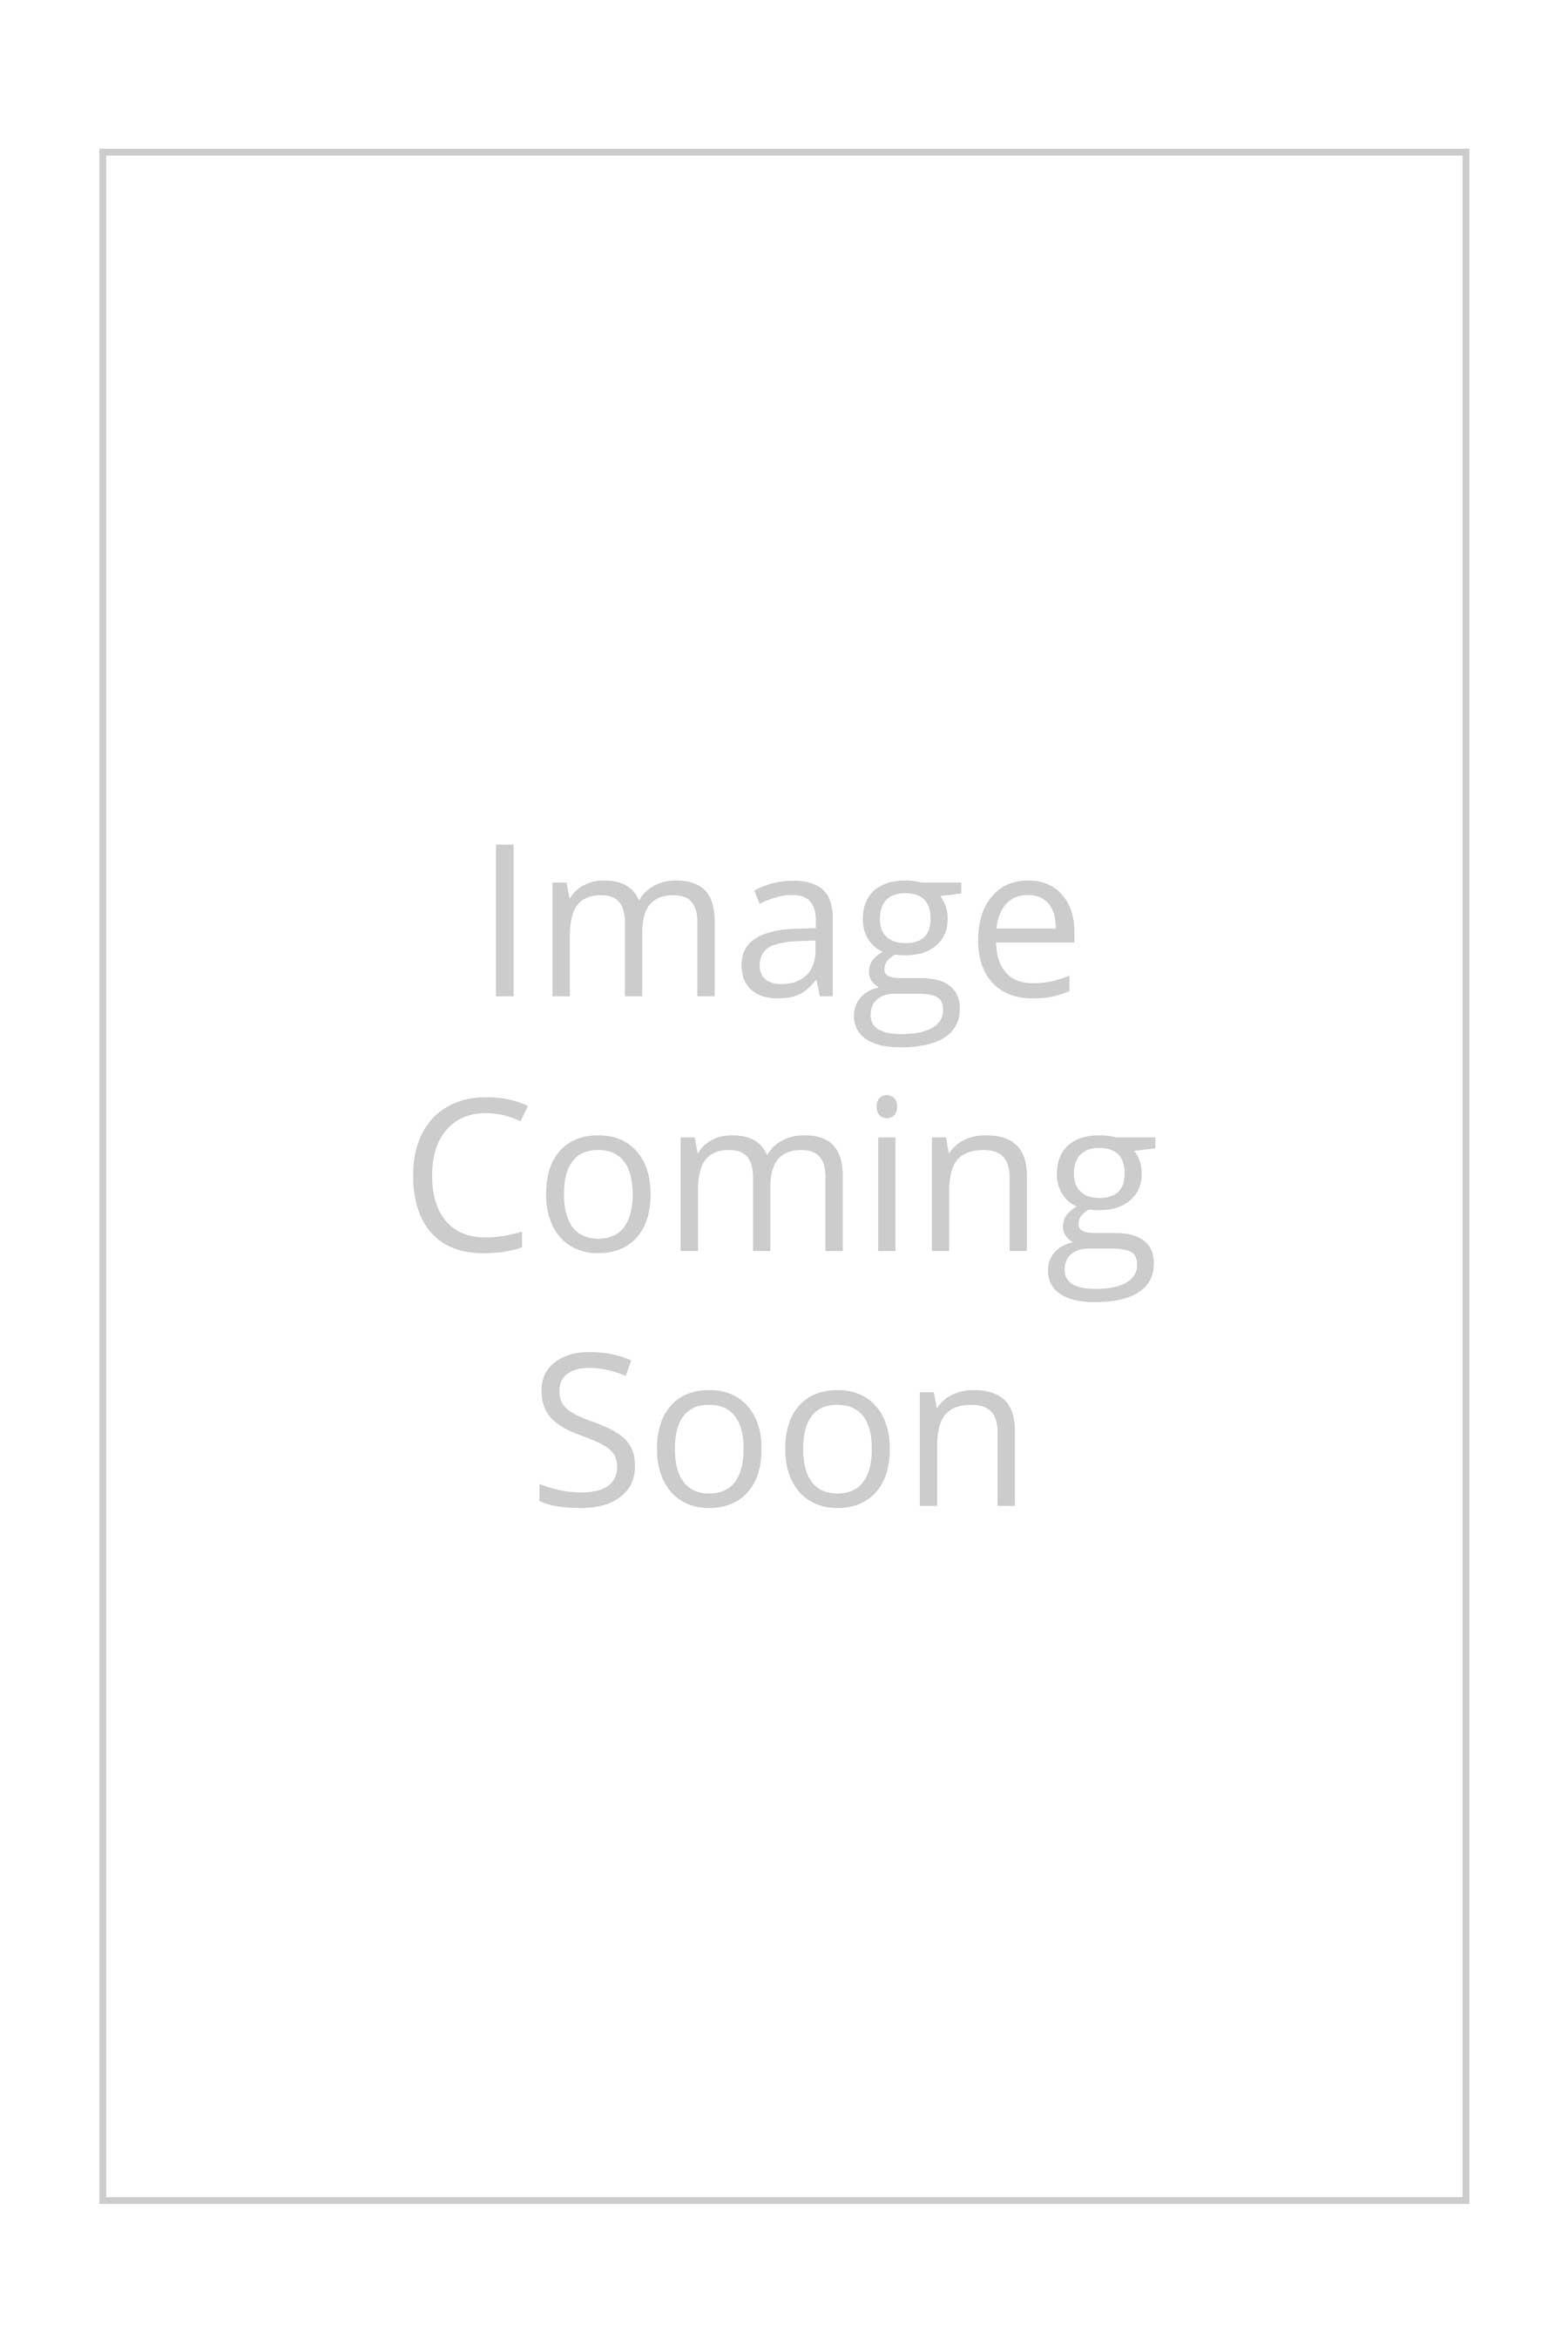 pandora-sterling-silver-14k-gold-y-letter-charm-790298y-